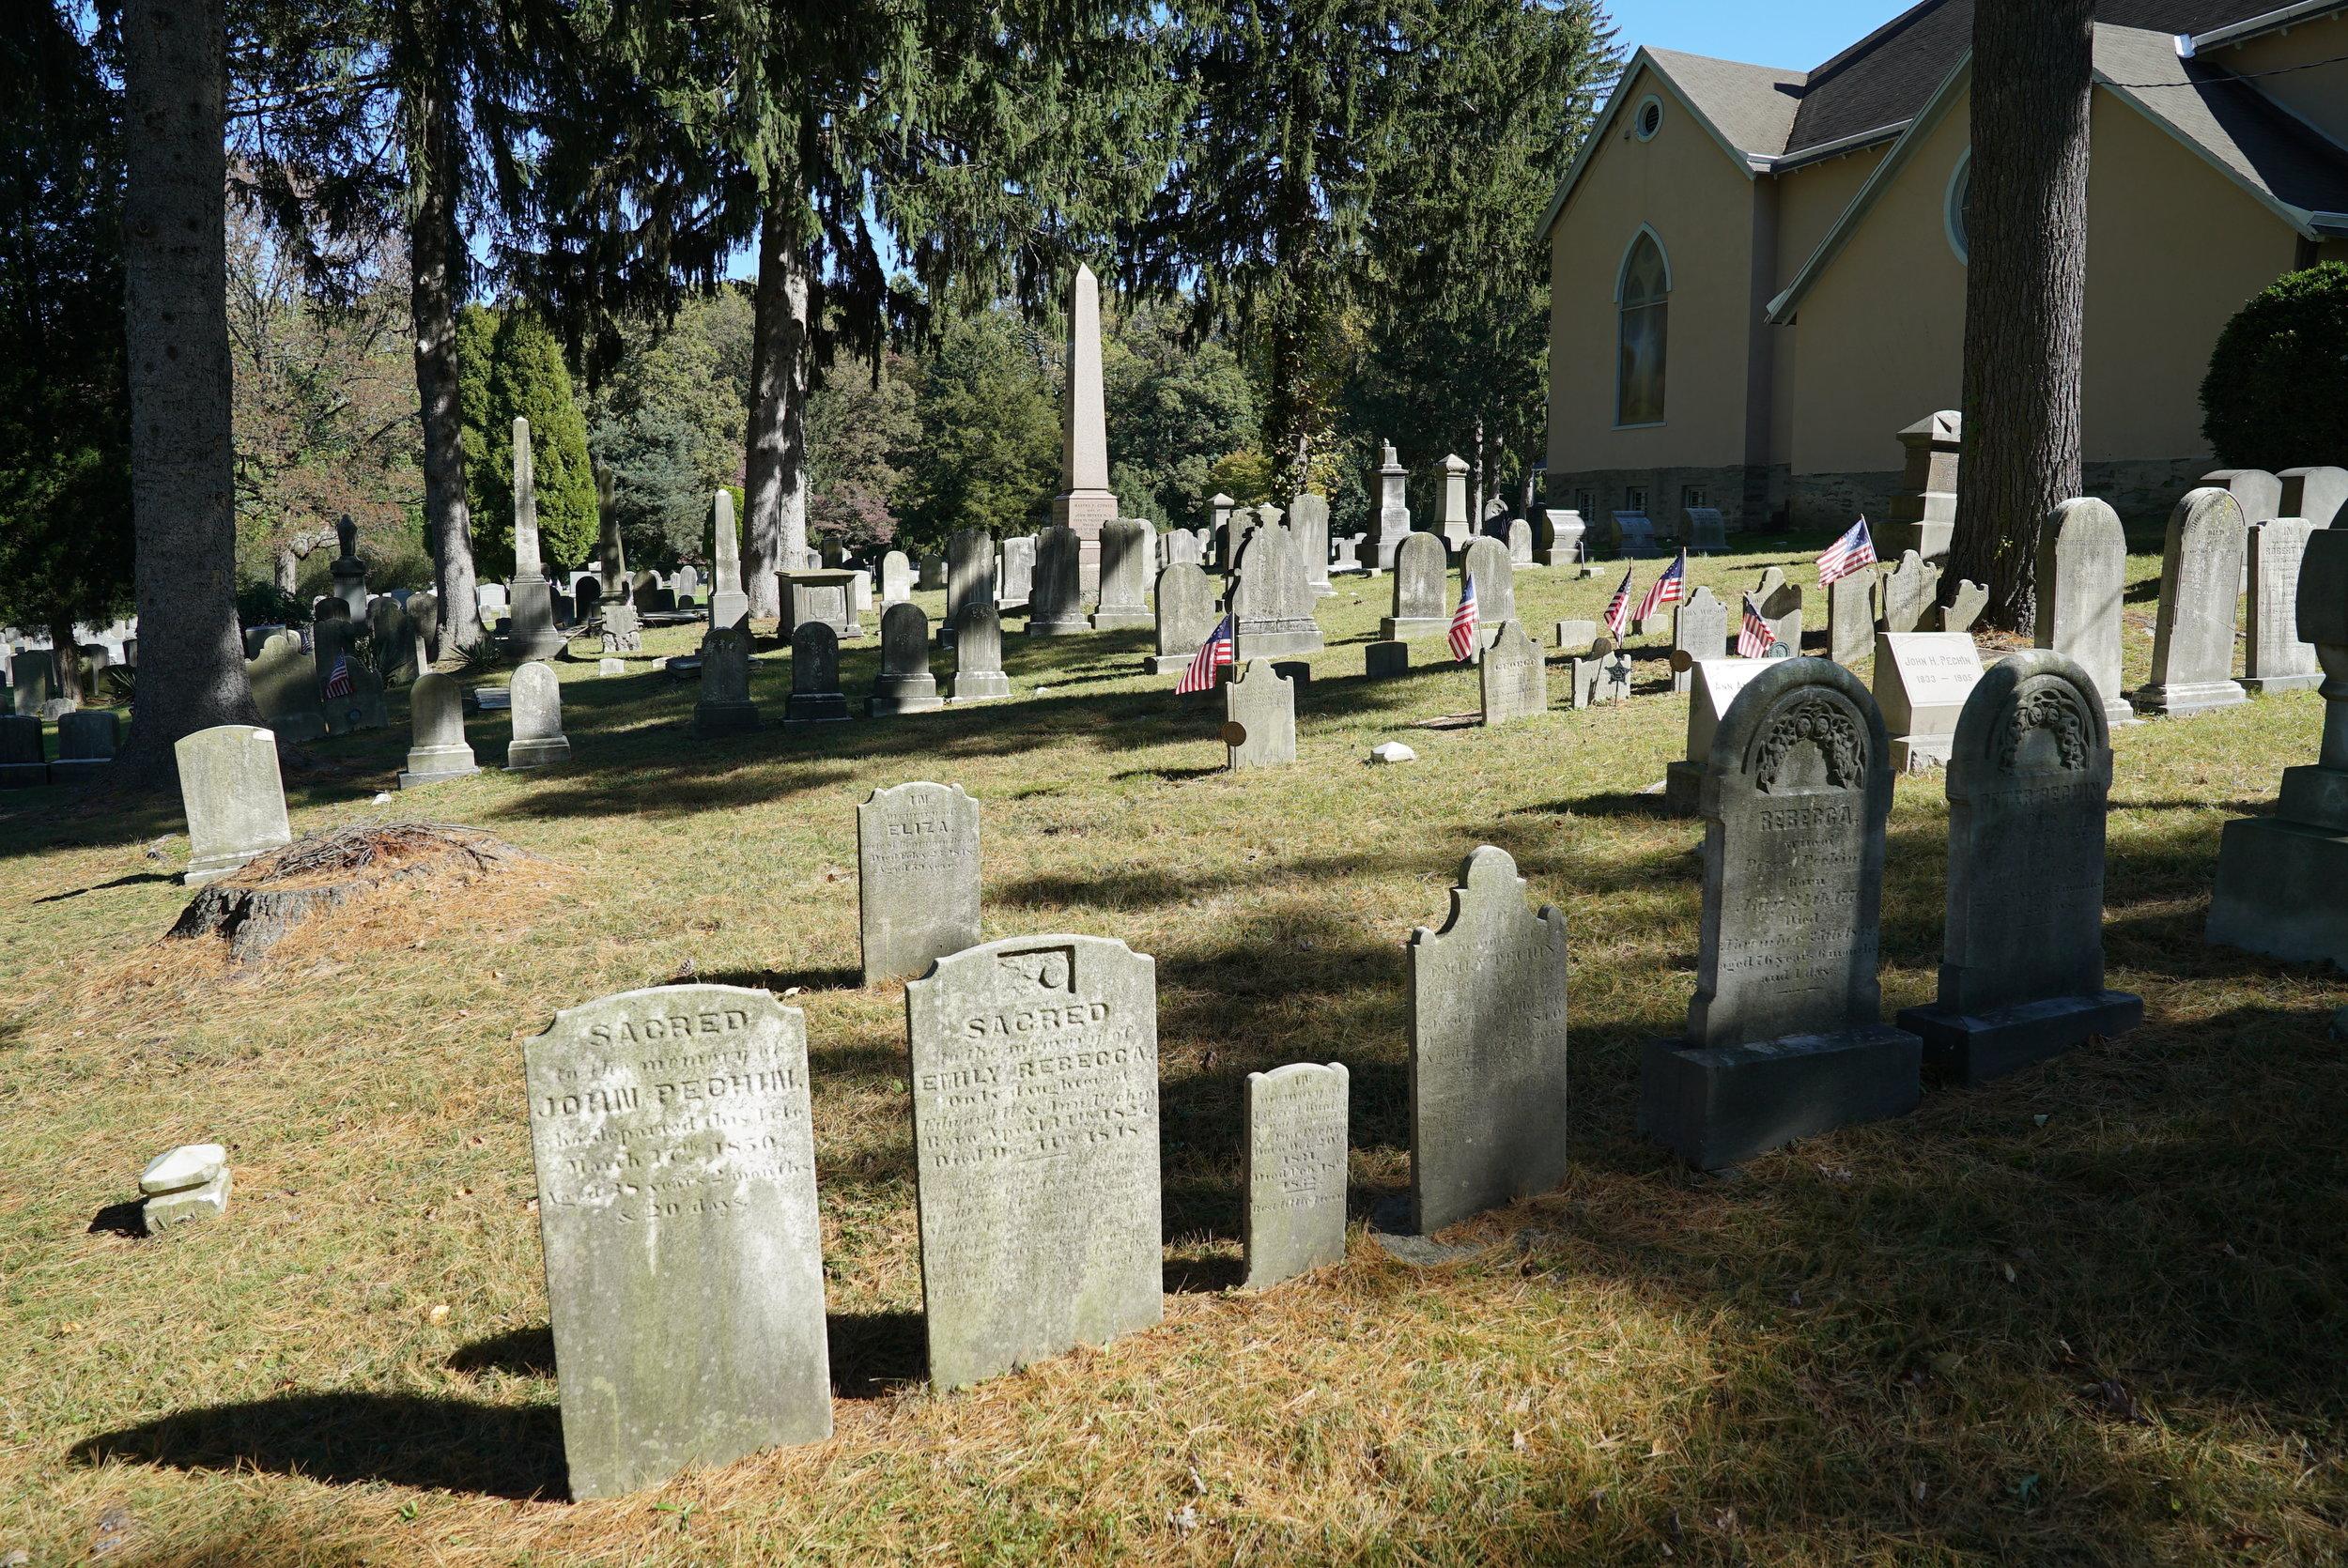 Lower Merion Baptist Church Cemetery. Bryn Mawr, Pennsylvania.